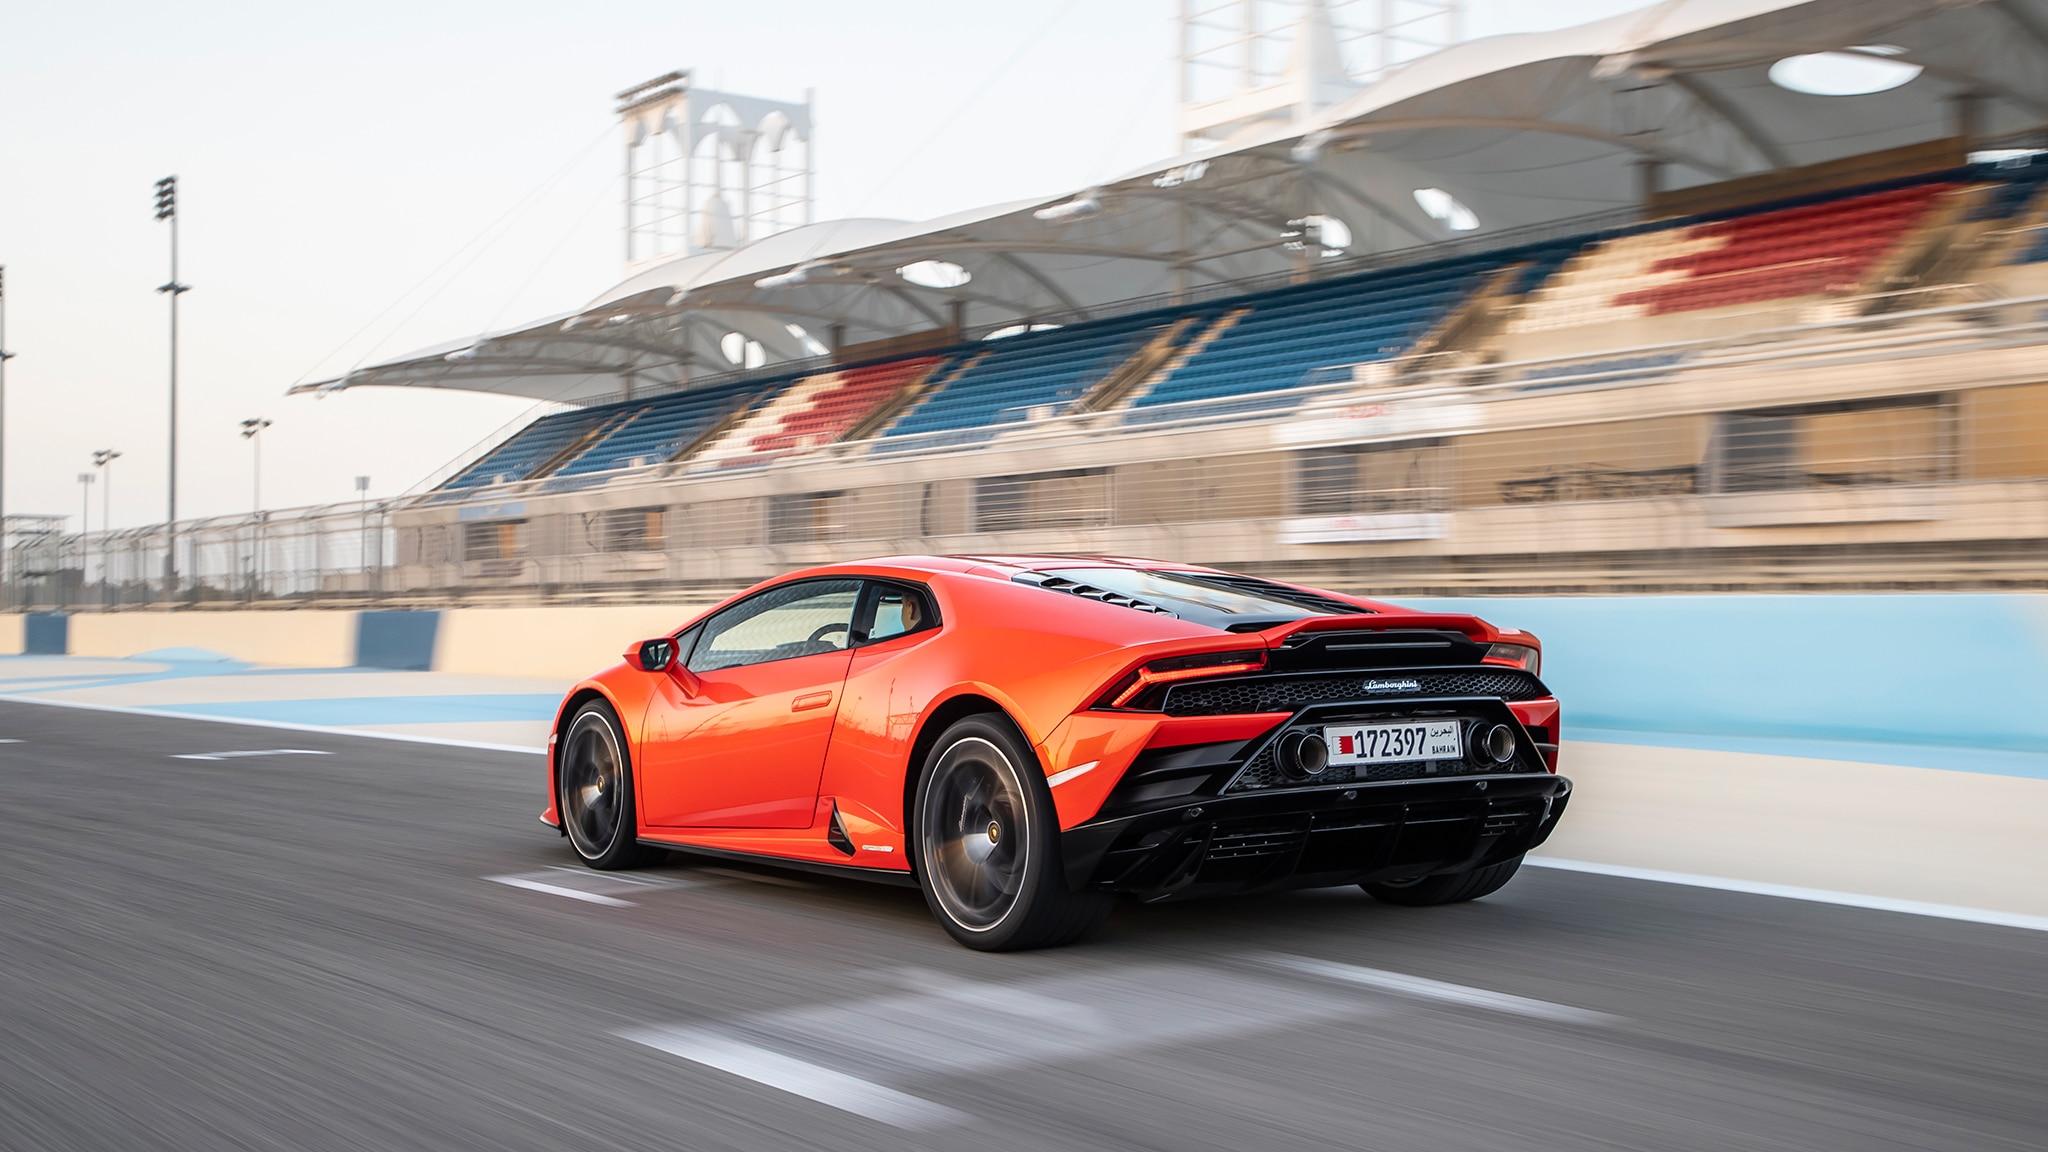 Lamborghini Huracan Evo Review It Freaking Rips Automobile Magazine